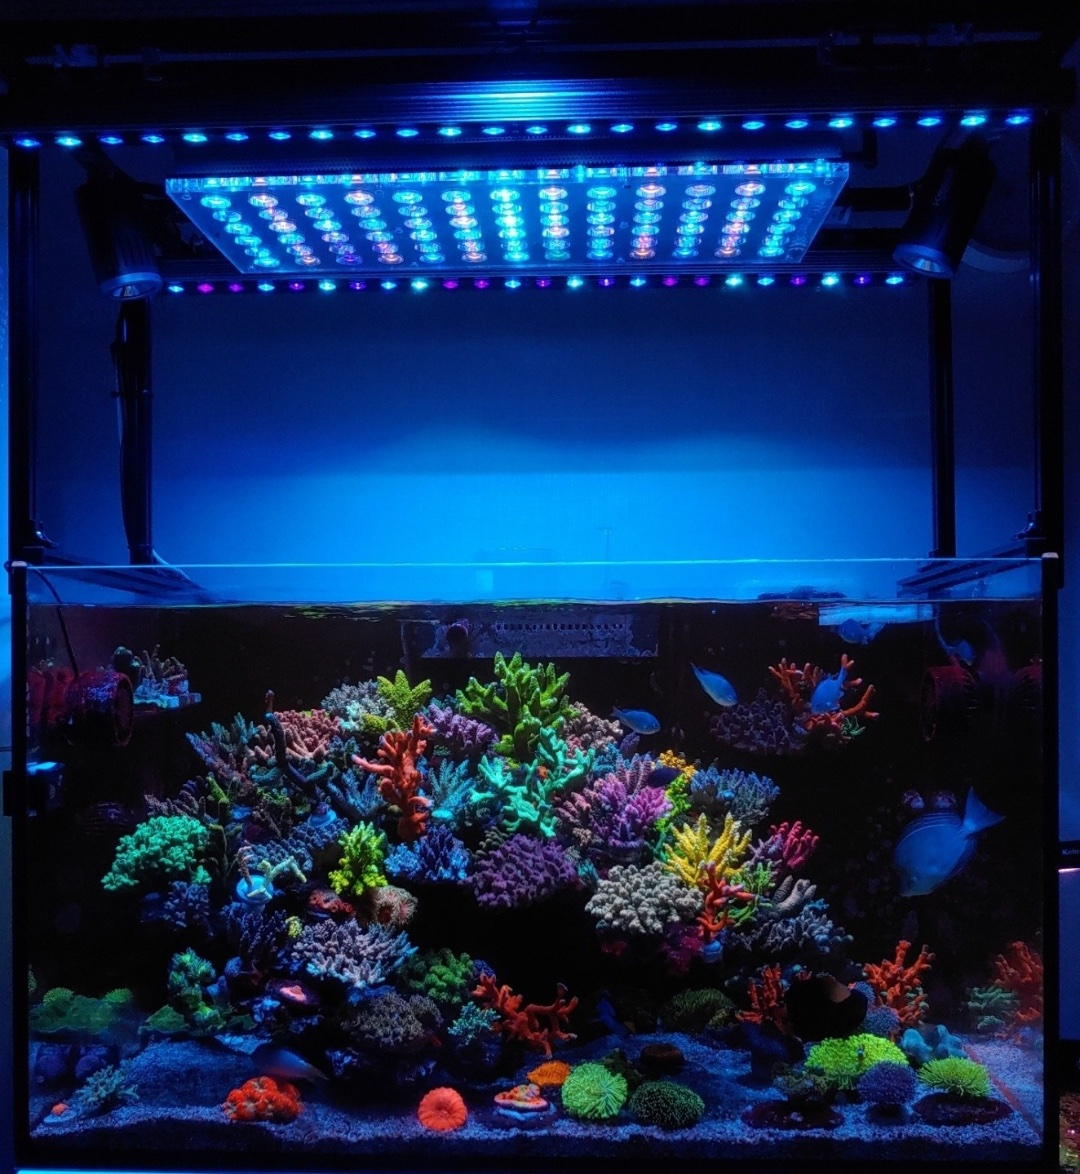 Orphek's Atlantik V4 avec barres LED pour aquarium OR3 Blue Sky Reef